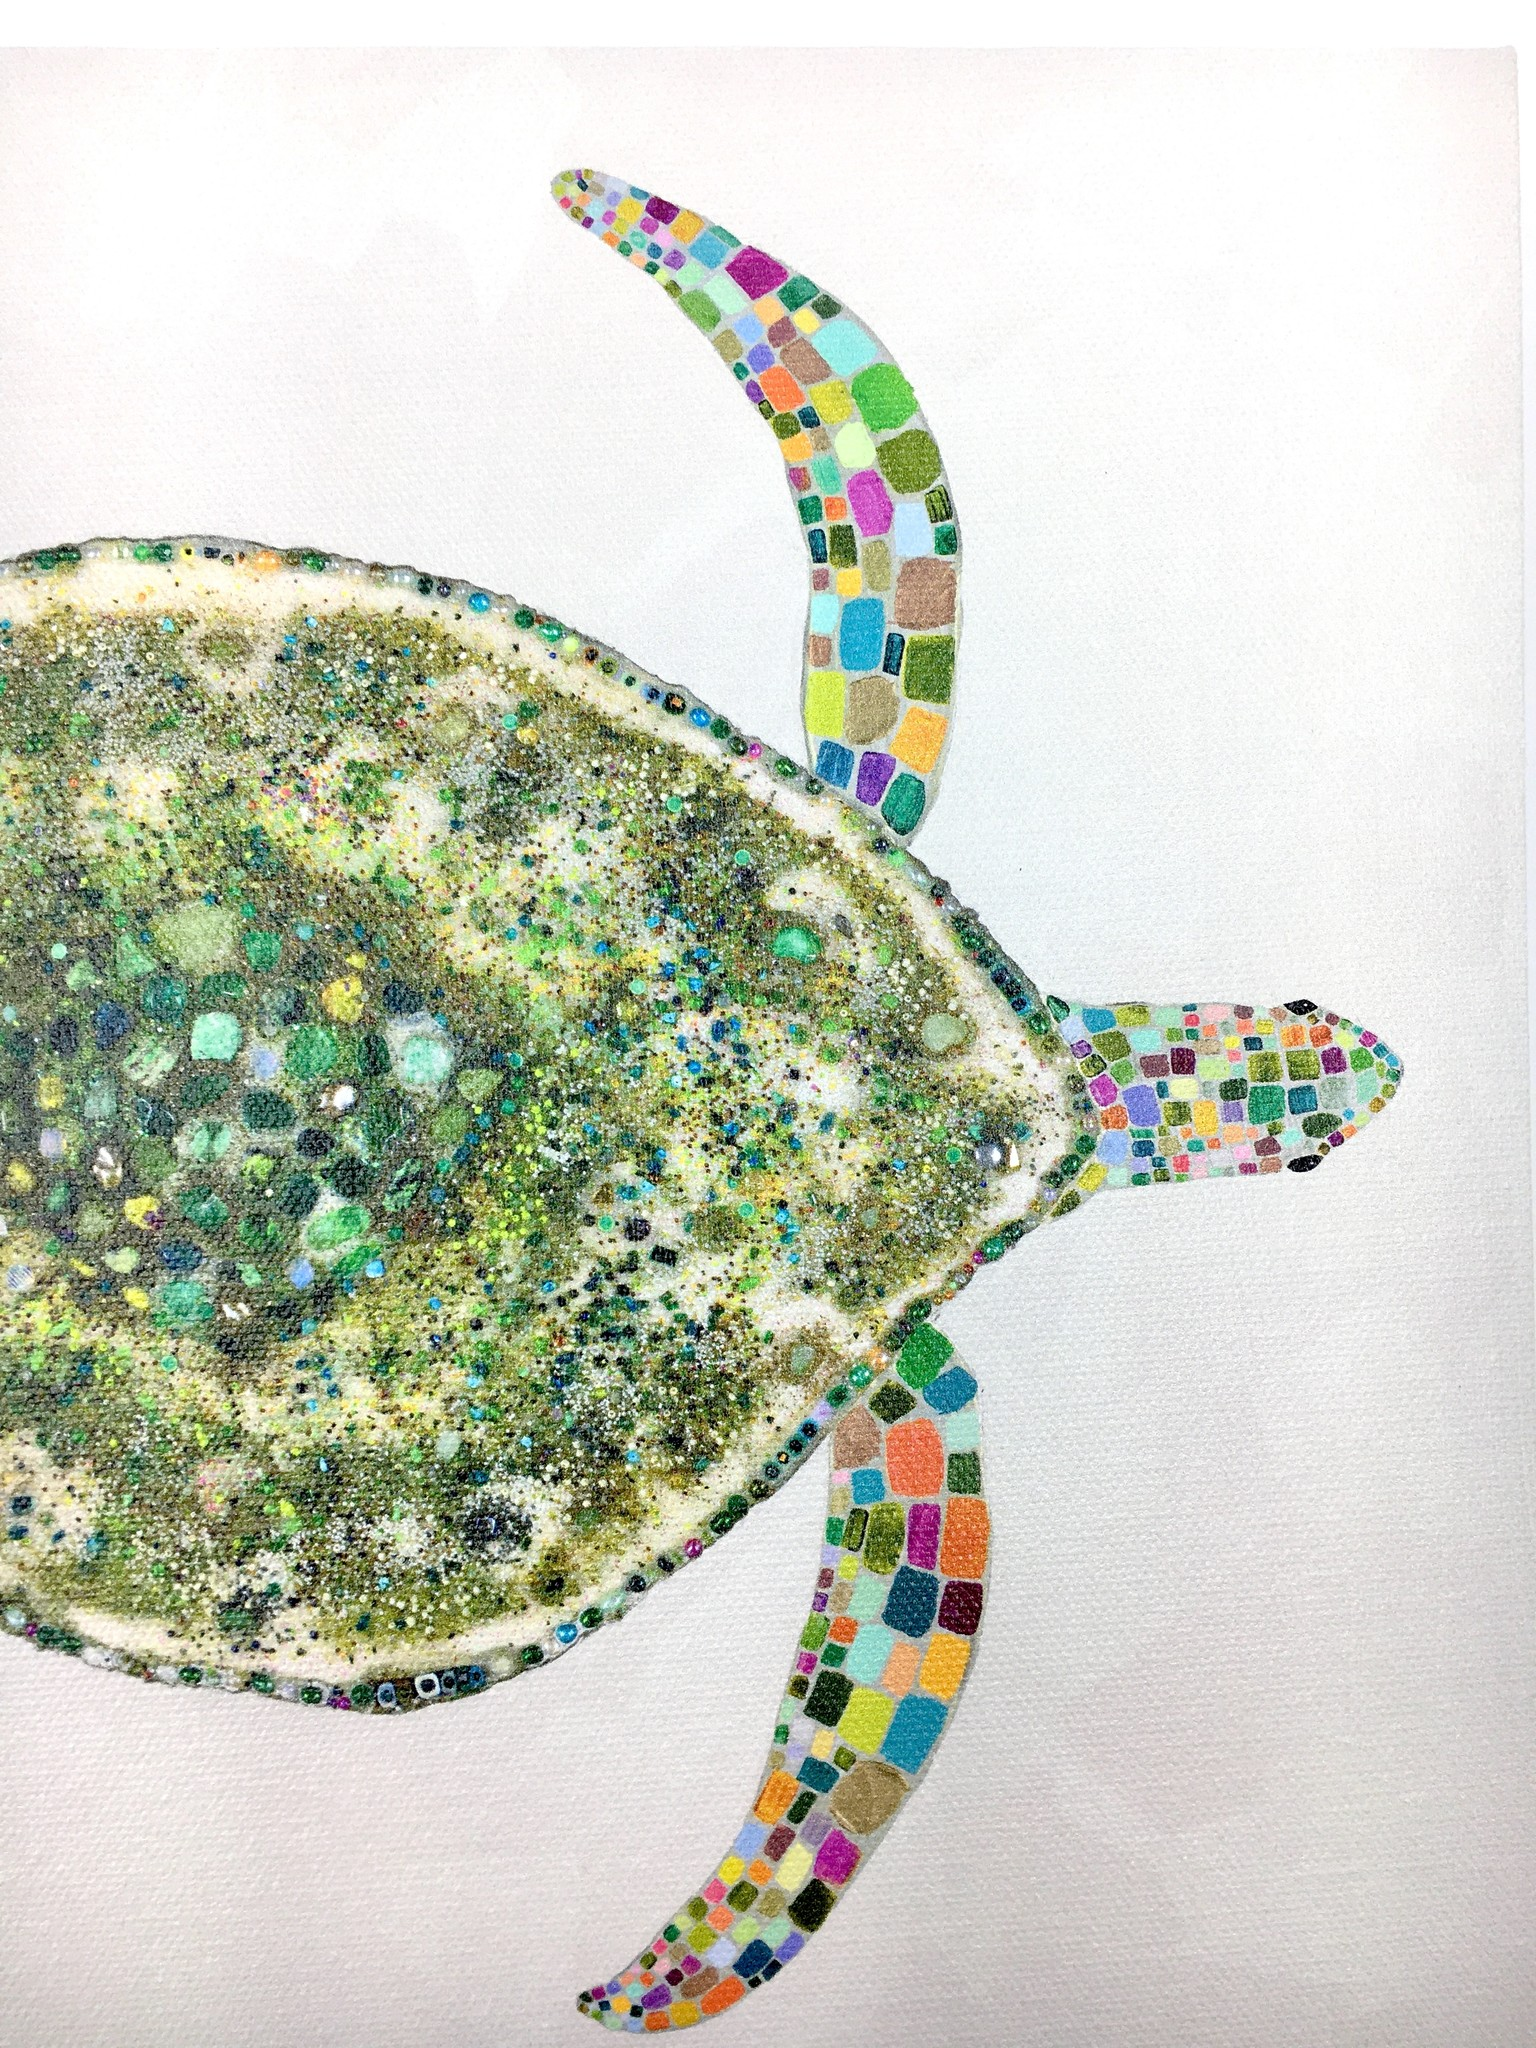 Jeweled Sea Turtle - 10x10 Canvas Art